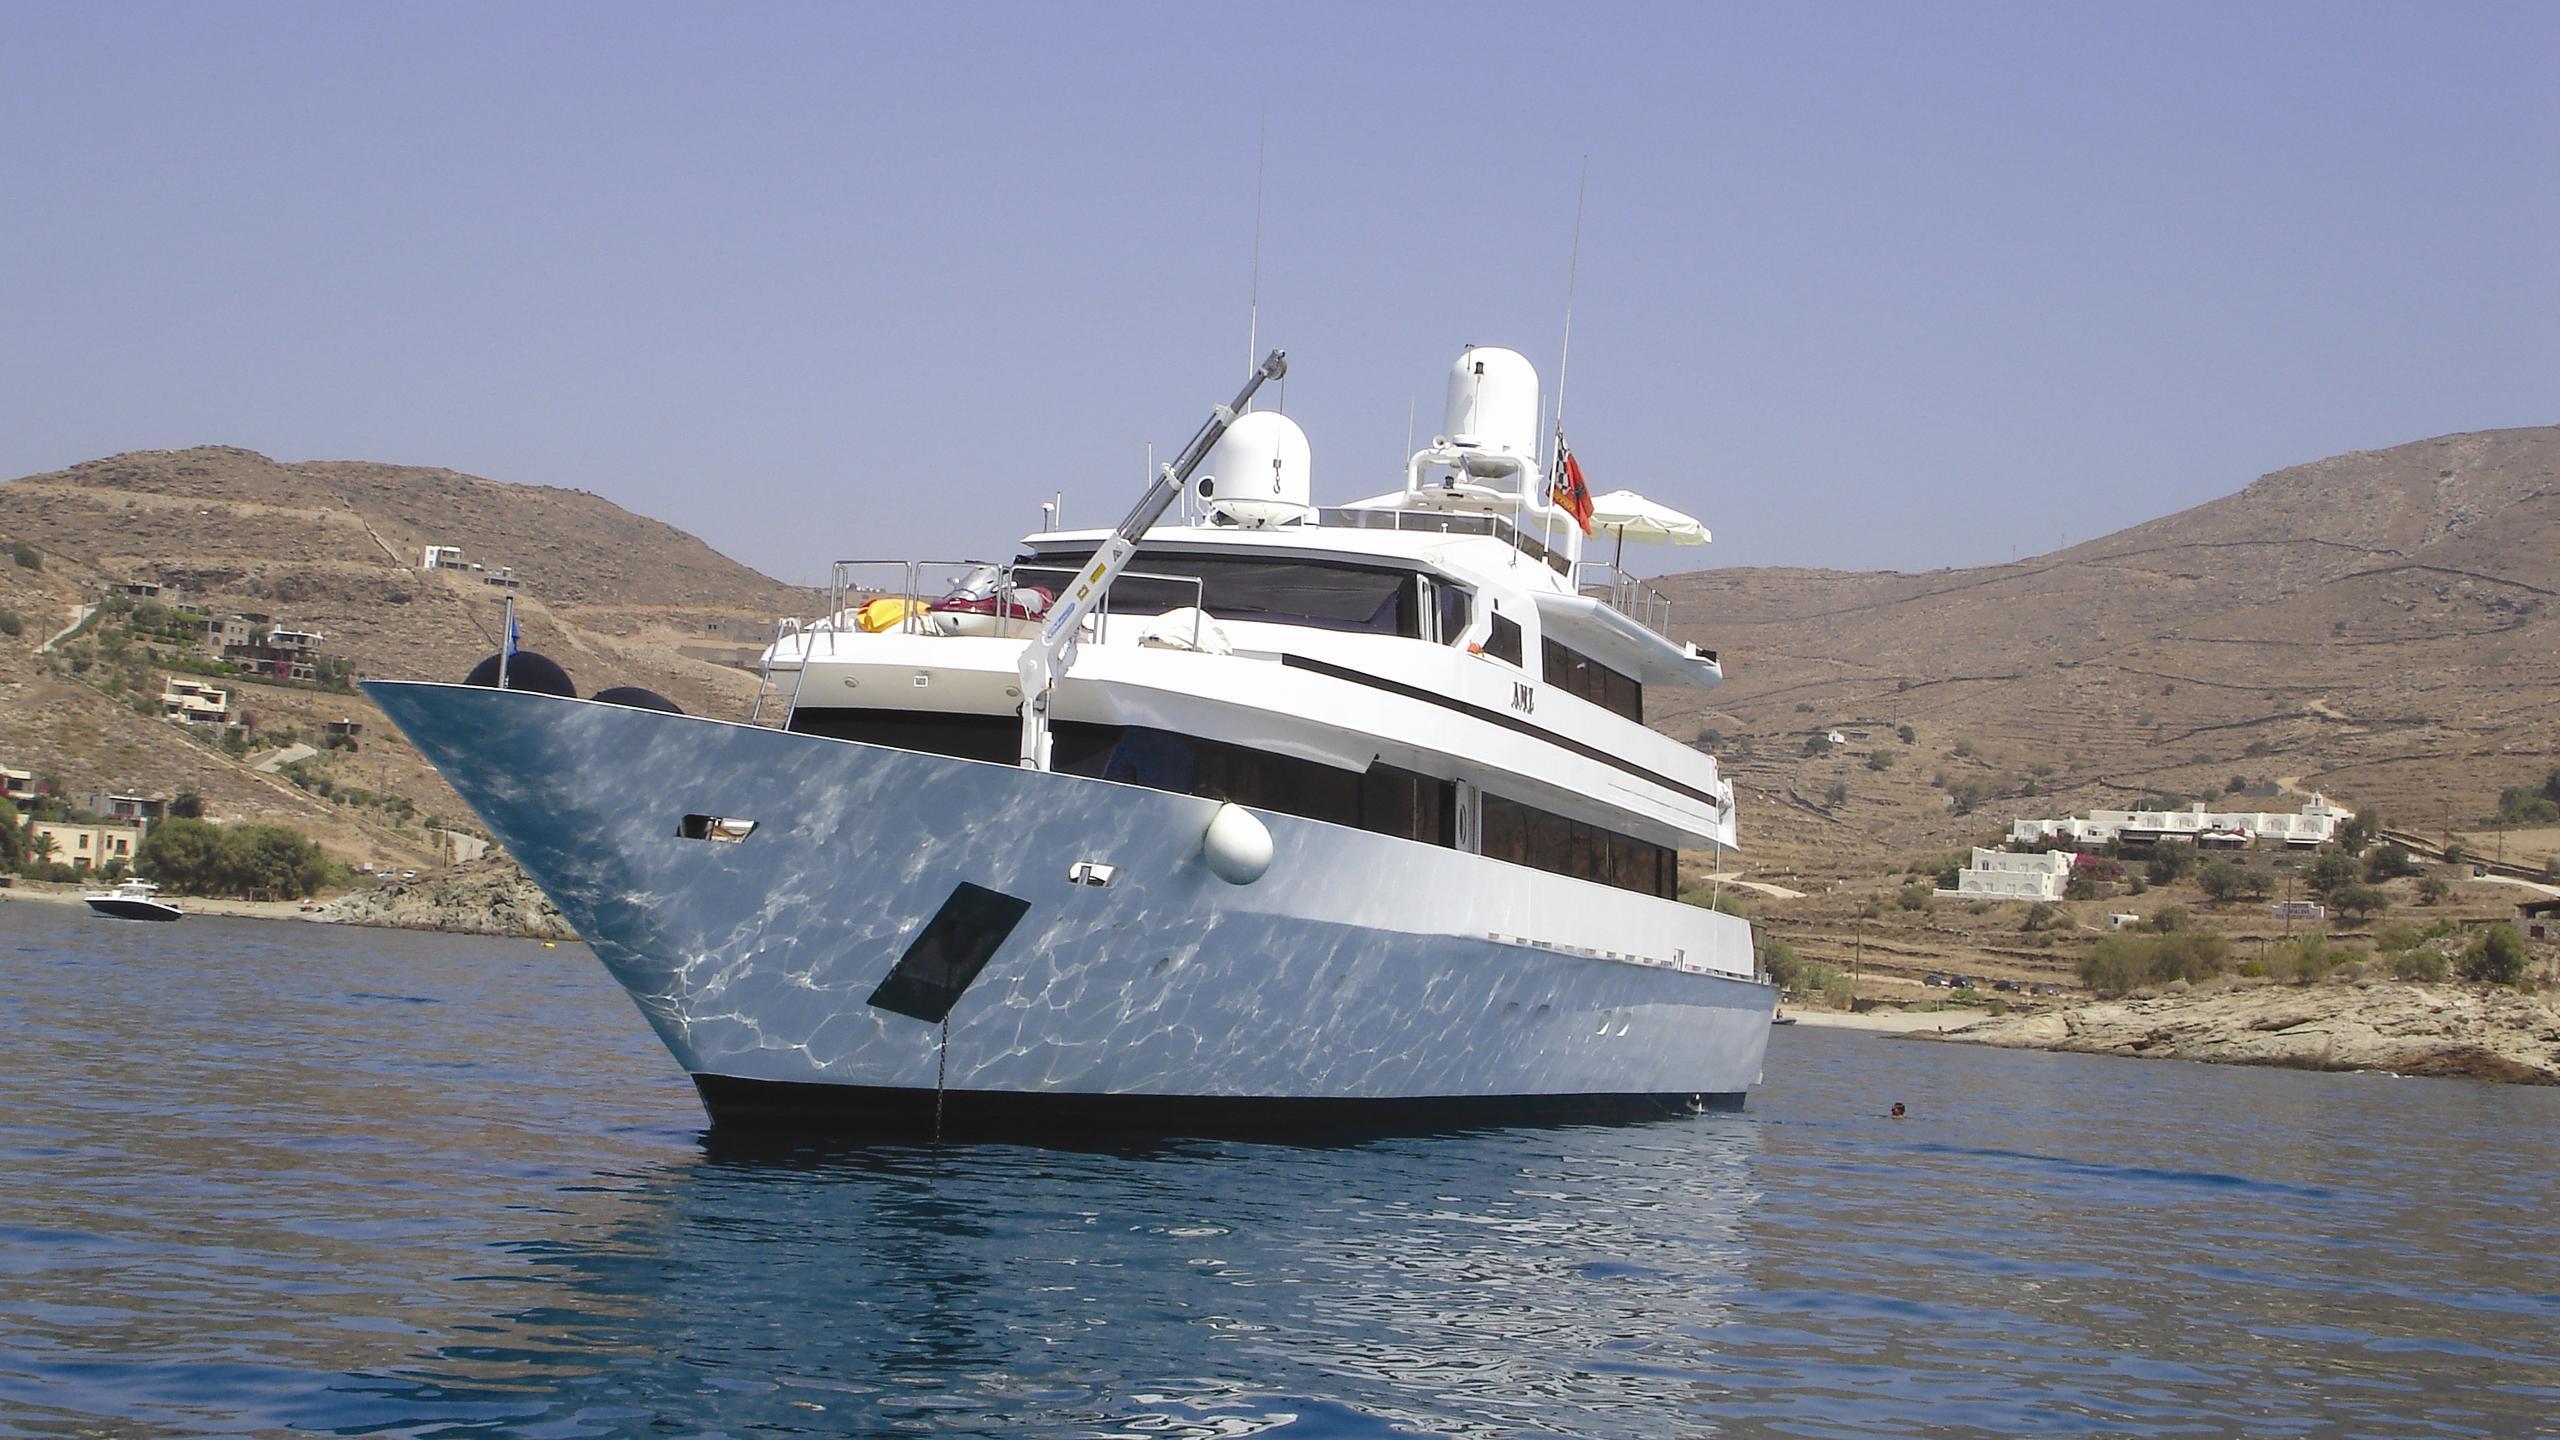 amz-yacht-cruising